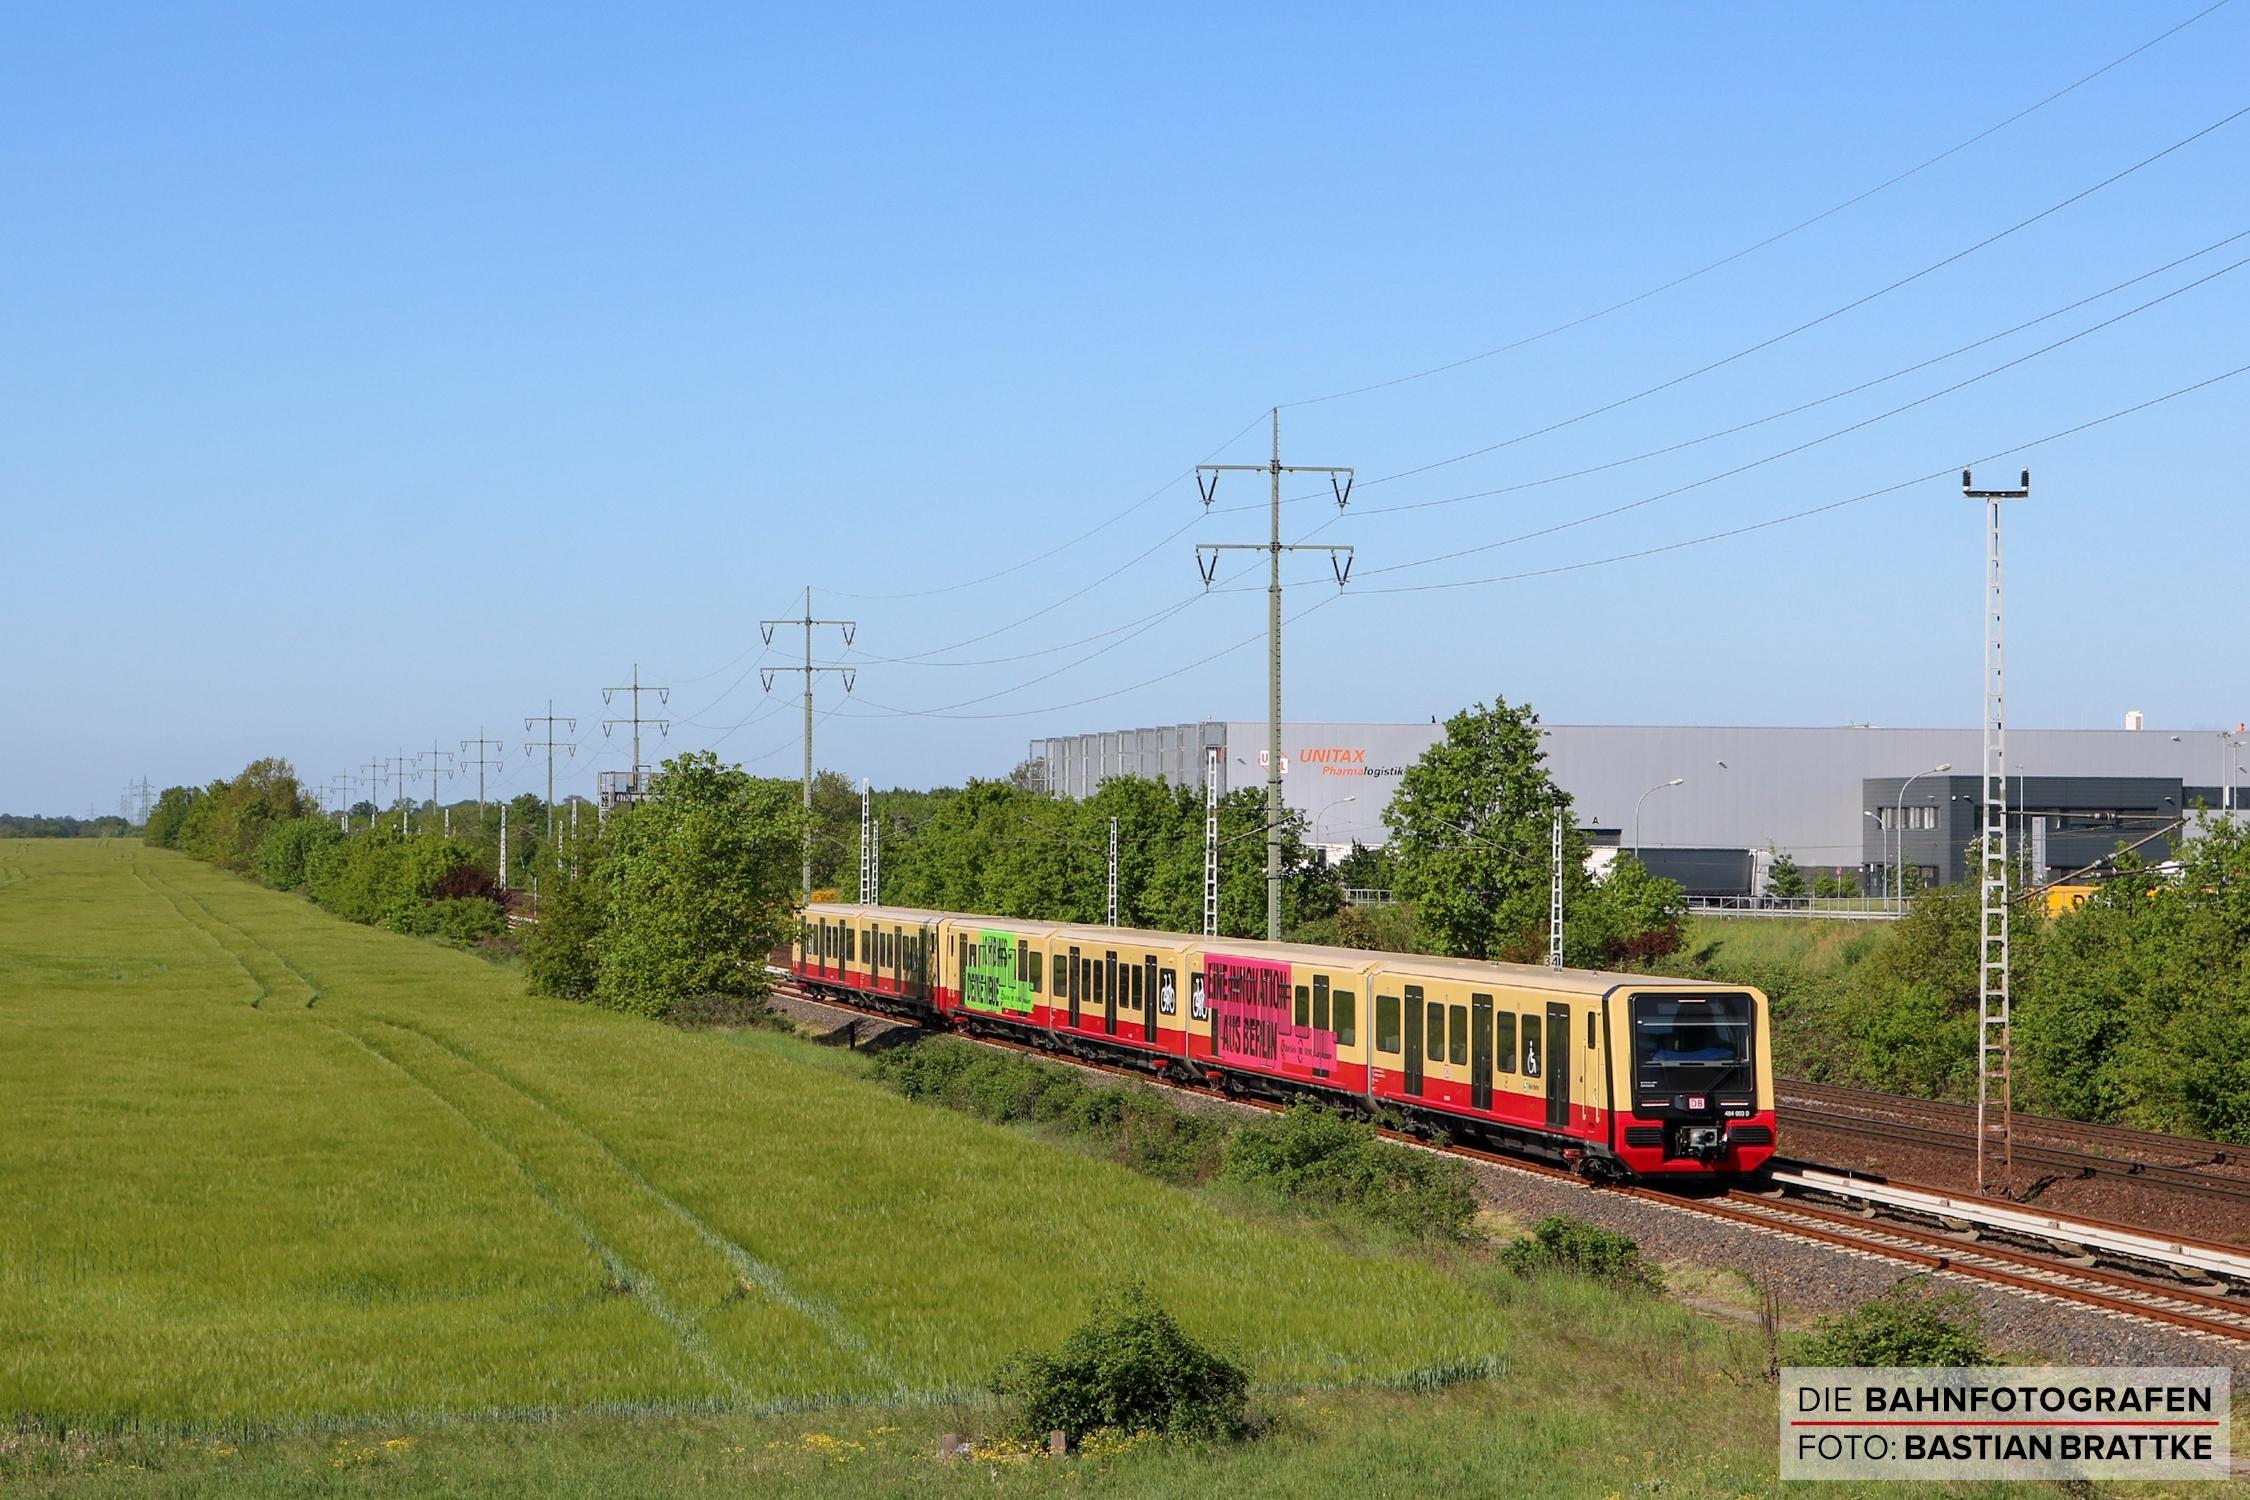 https://diebahnfotografen.de/wp-content/uploads/2020/06/484-003-483-002-Wa%C3%9Fmannsdorf-Sch%C3%B6nefeld.jpg